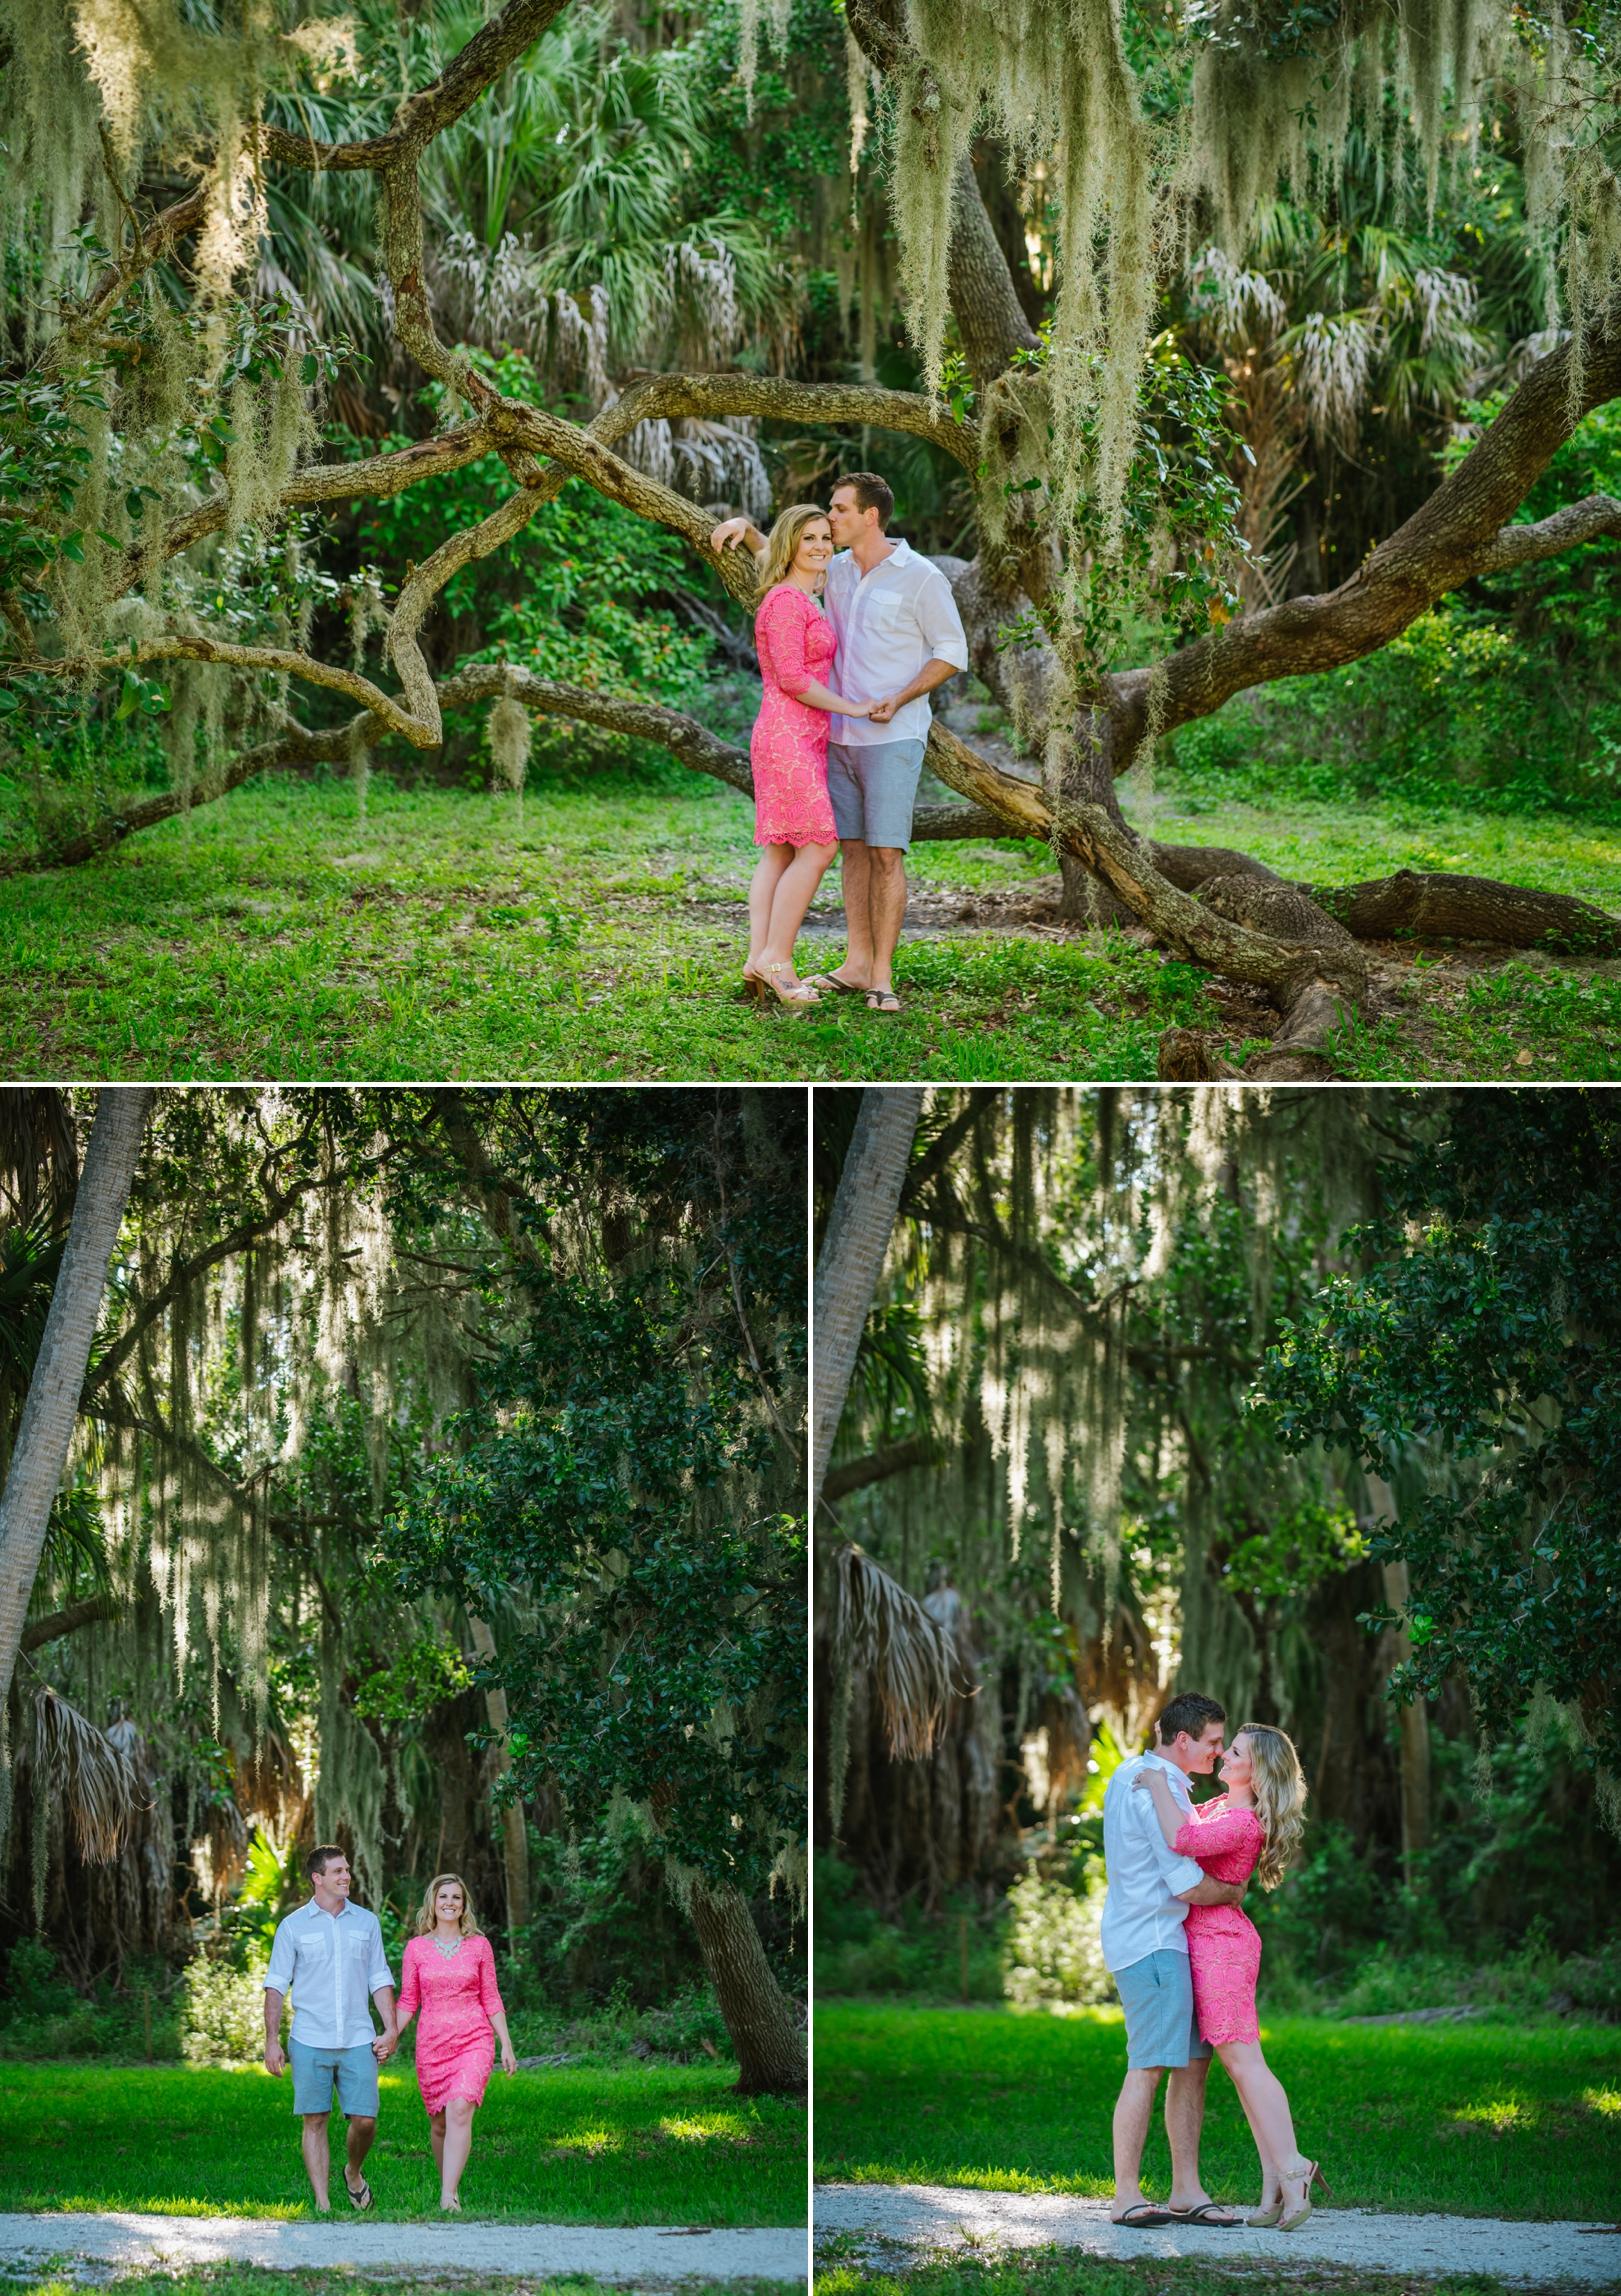 tampa-wedding-photographer-engagement-nature-outdoor-florida_0002.jpg